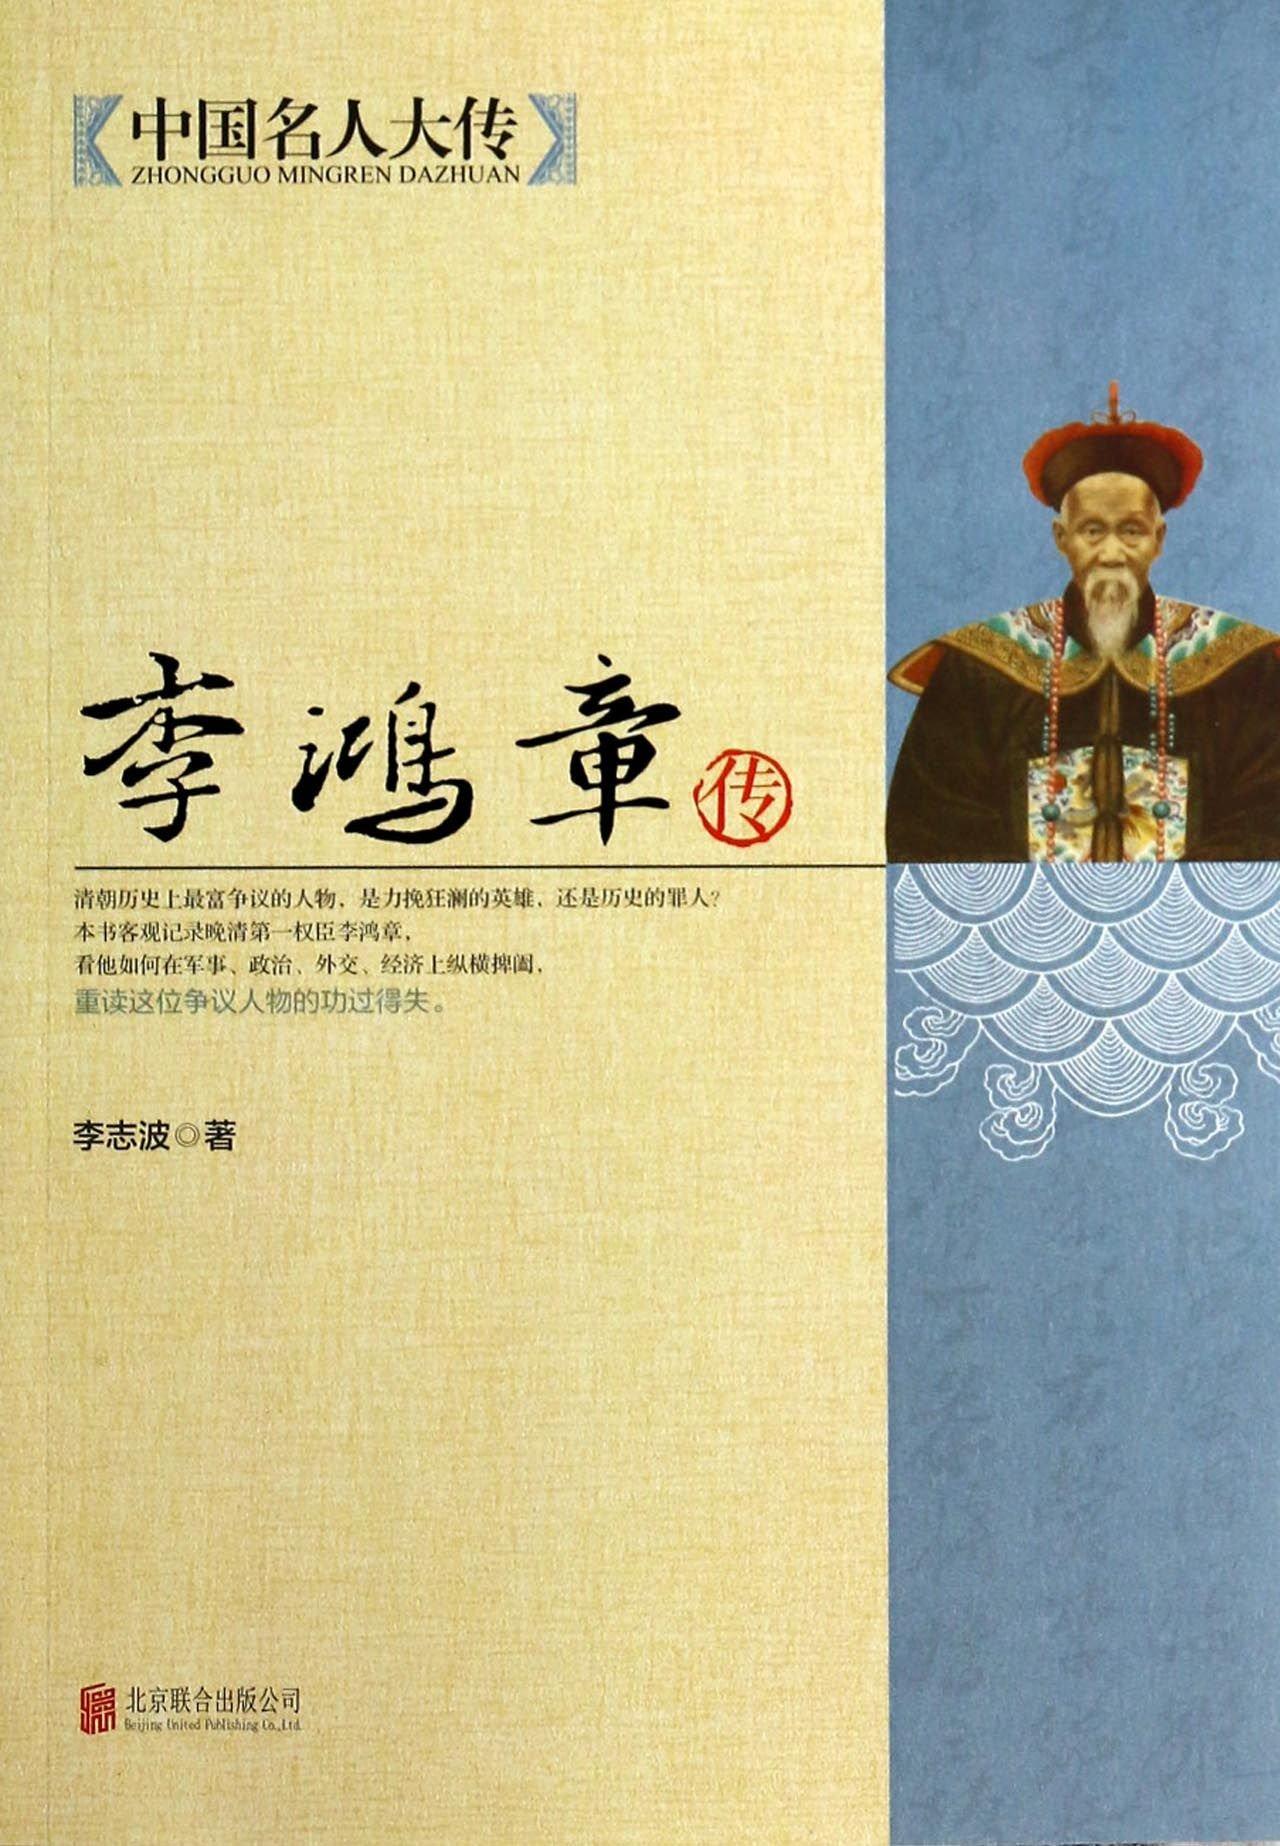 Download China's National People's Congress pass: li hongzhang(Chinese Edition) pdf